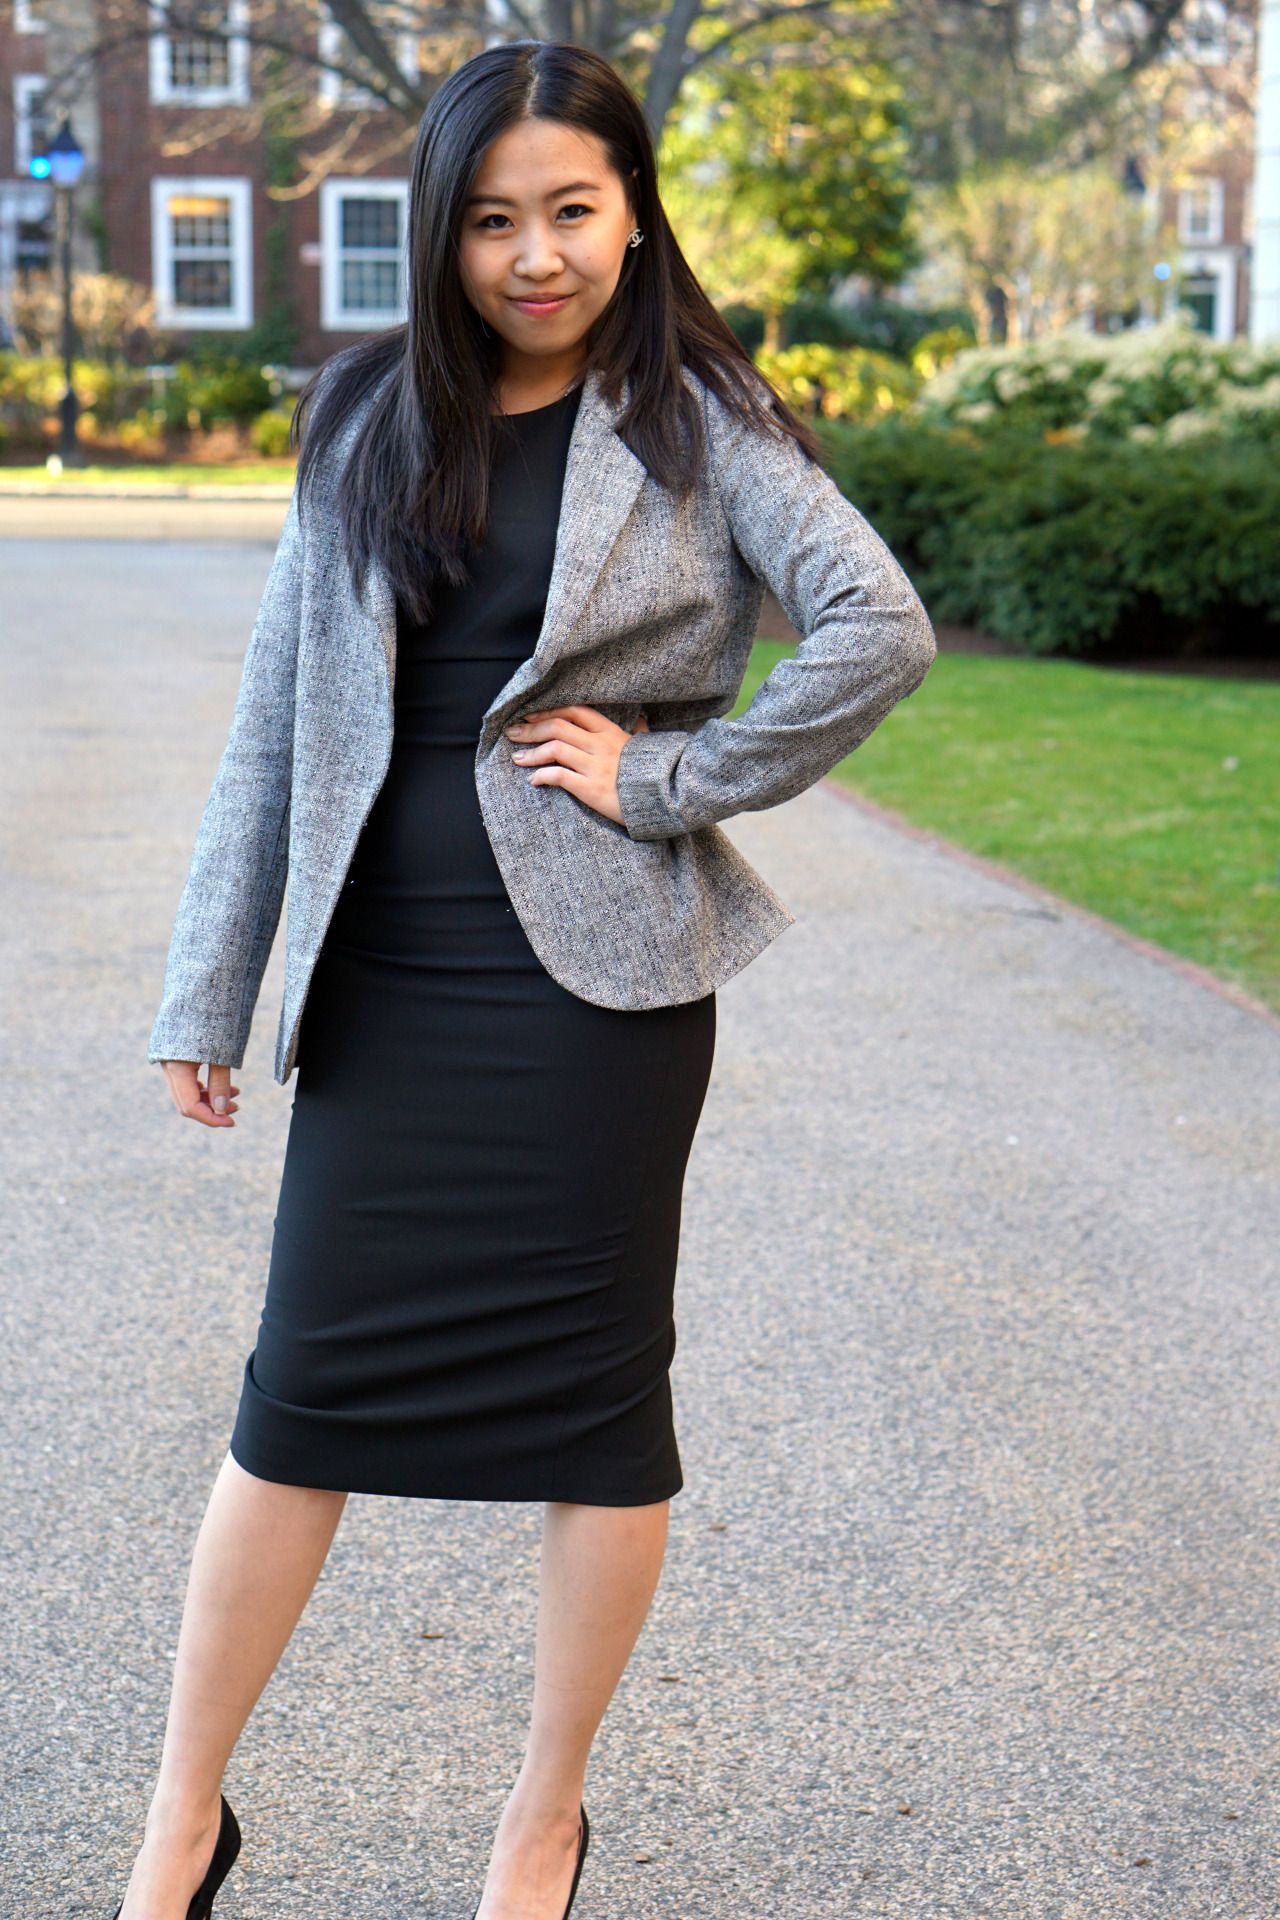 Black Halter Dress With Long Grey Blazer Skirt The Ceiling Rok [ 1920 x 1280 Pixel ]